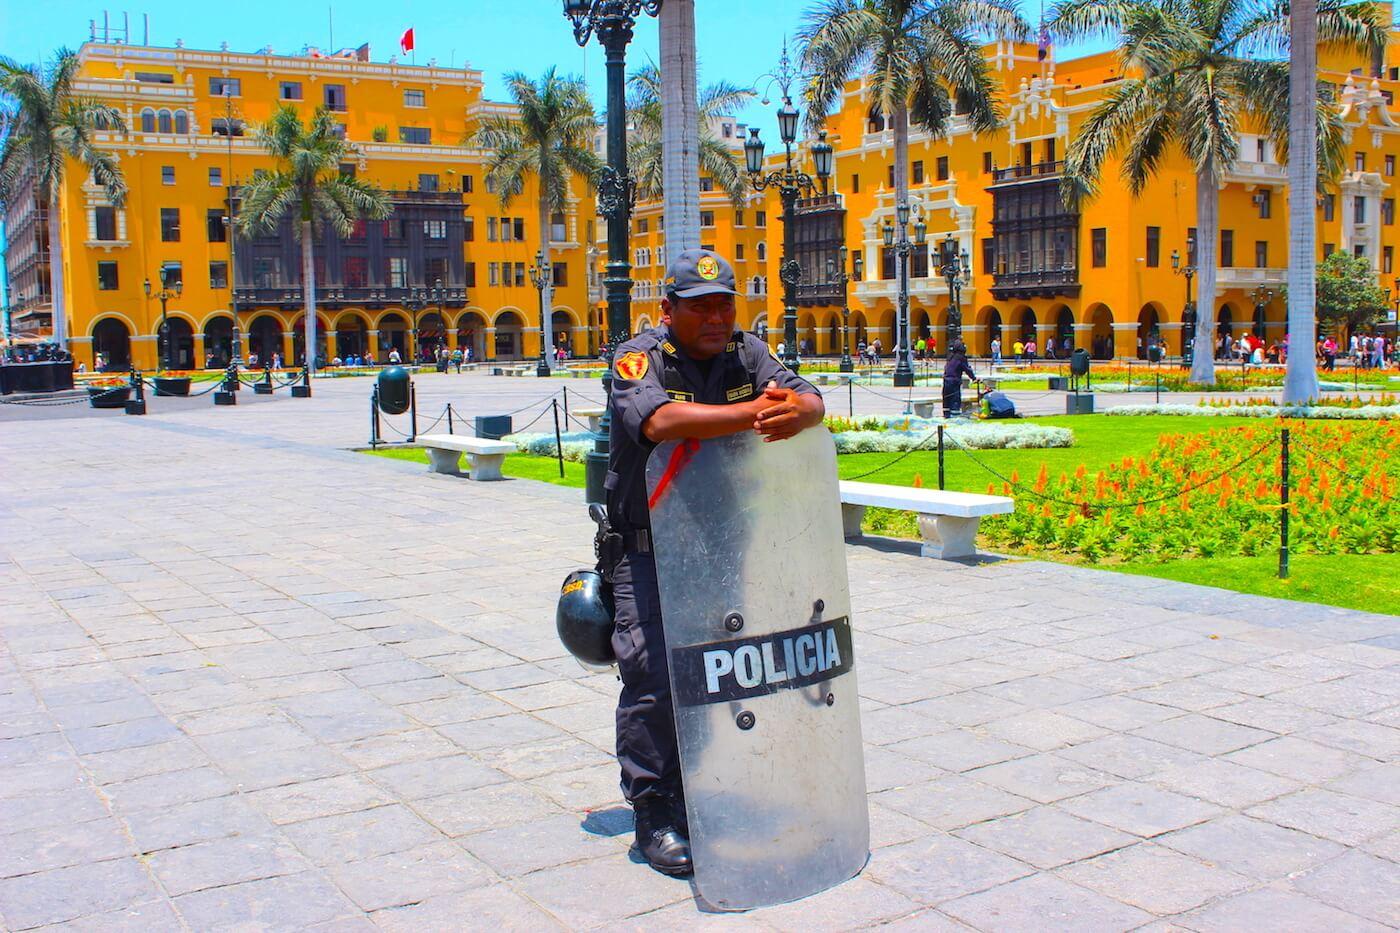 lima police in city centre